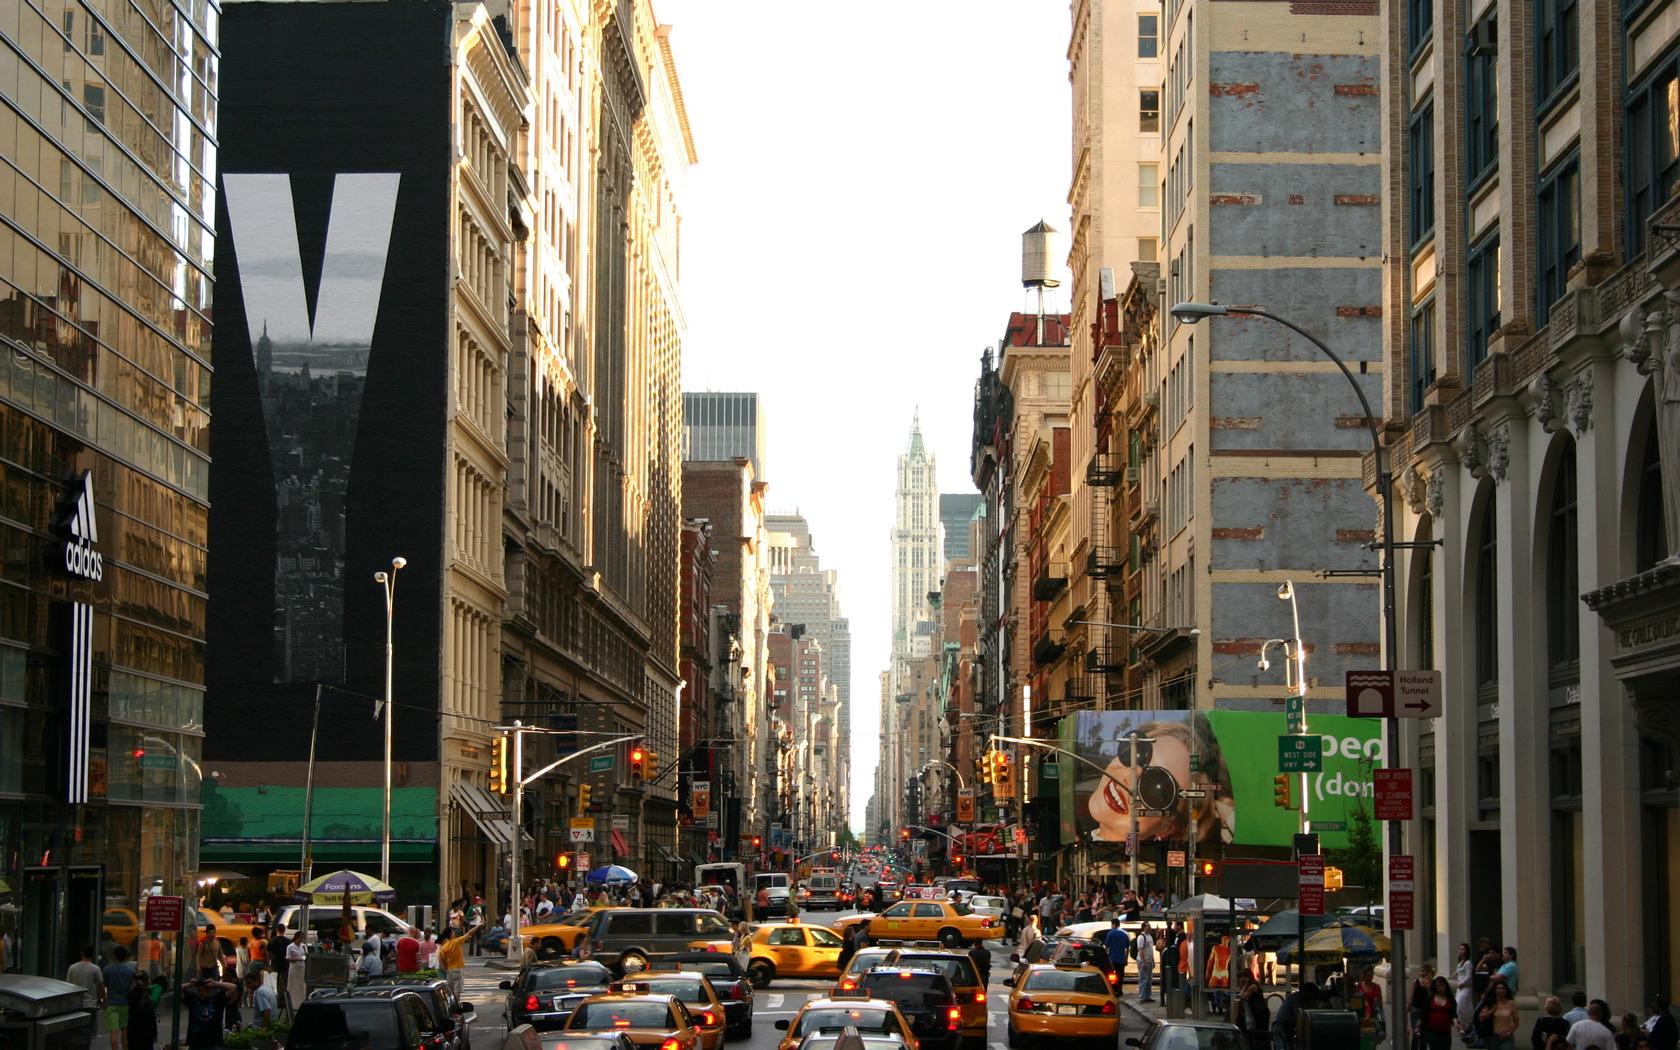 New York City Street Wallpapers 1680x1050 pixel Travel HD Wallpaper 1680x1050